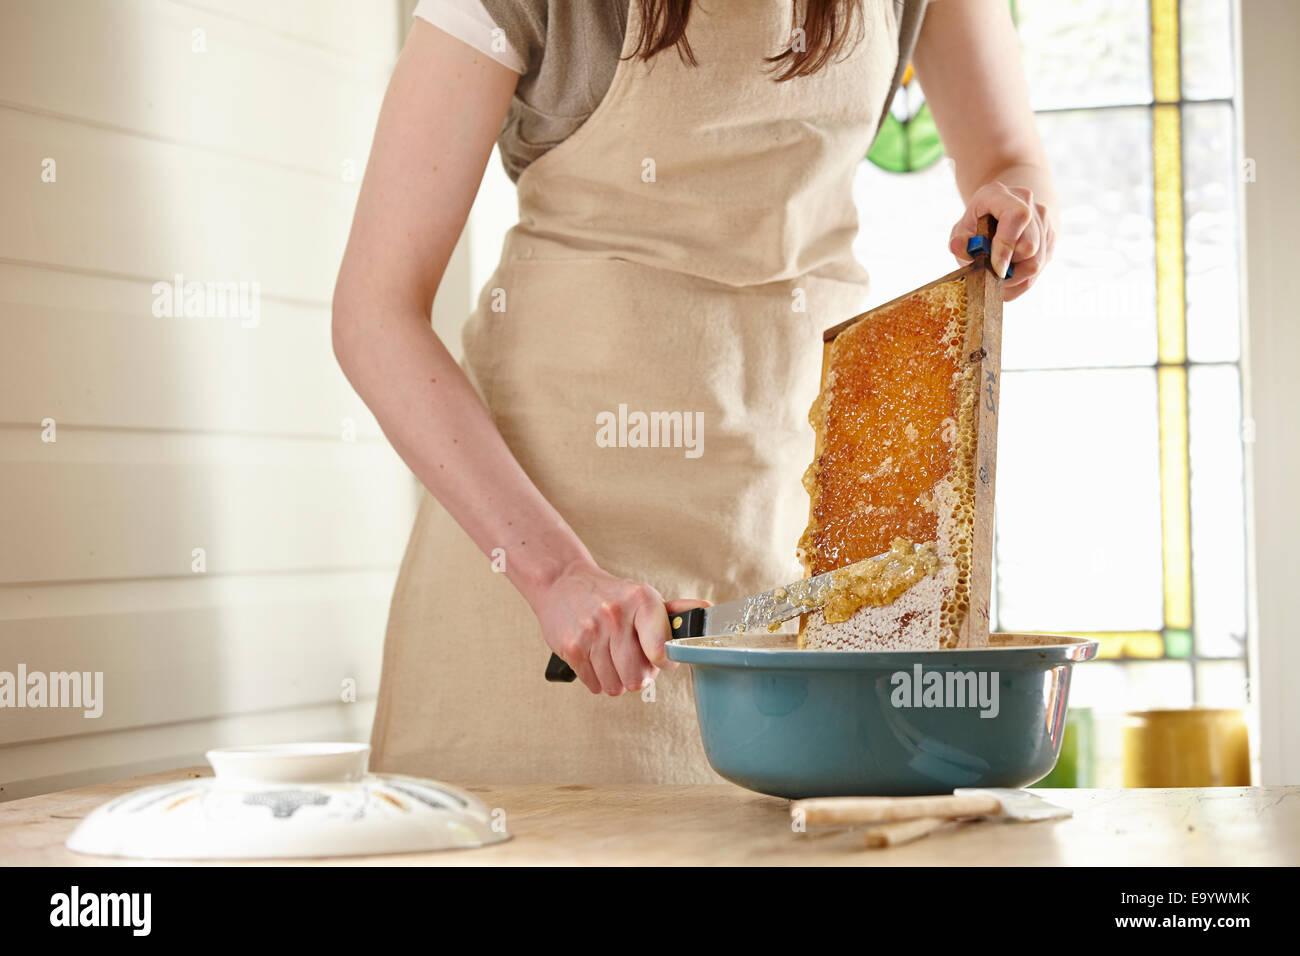 Apicultor femenino en cocina raspado 'super' (honeycomb bastidor) Imagen De Stock